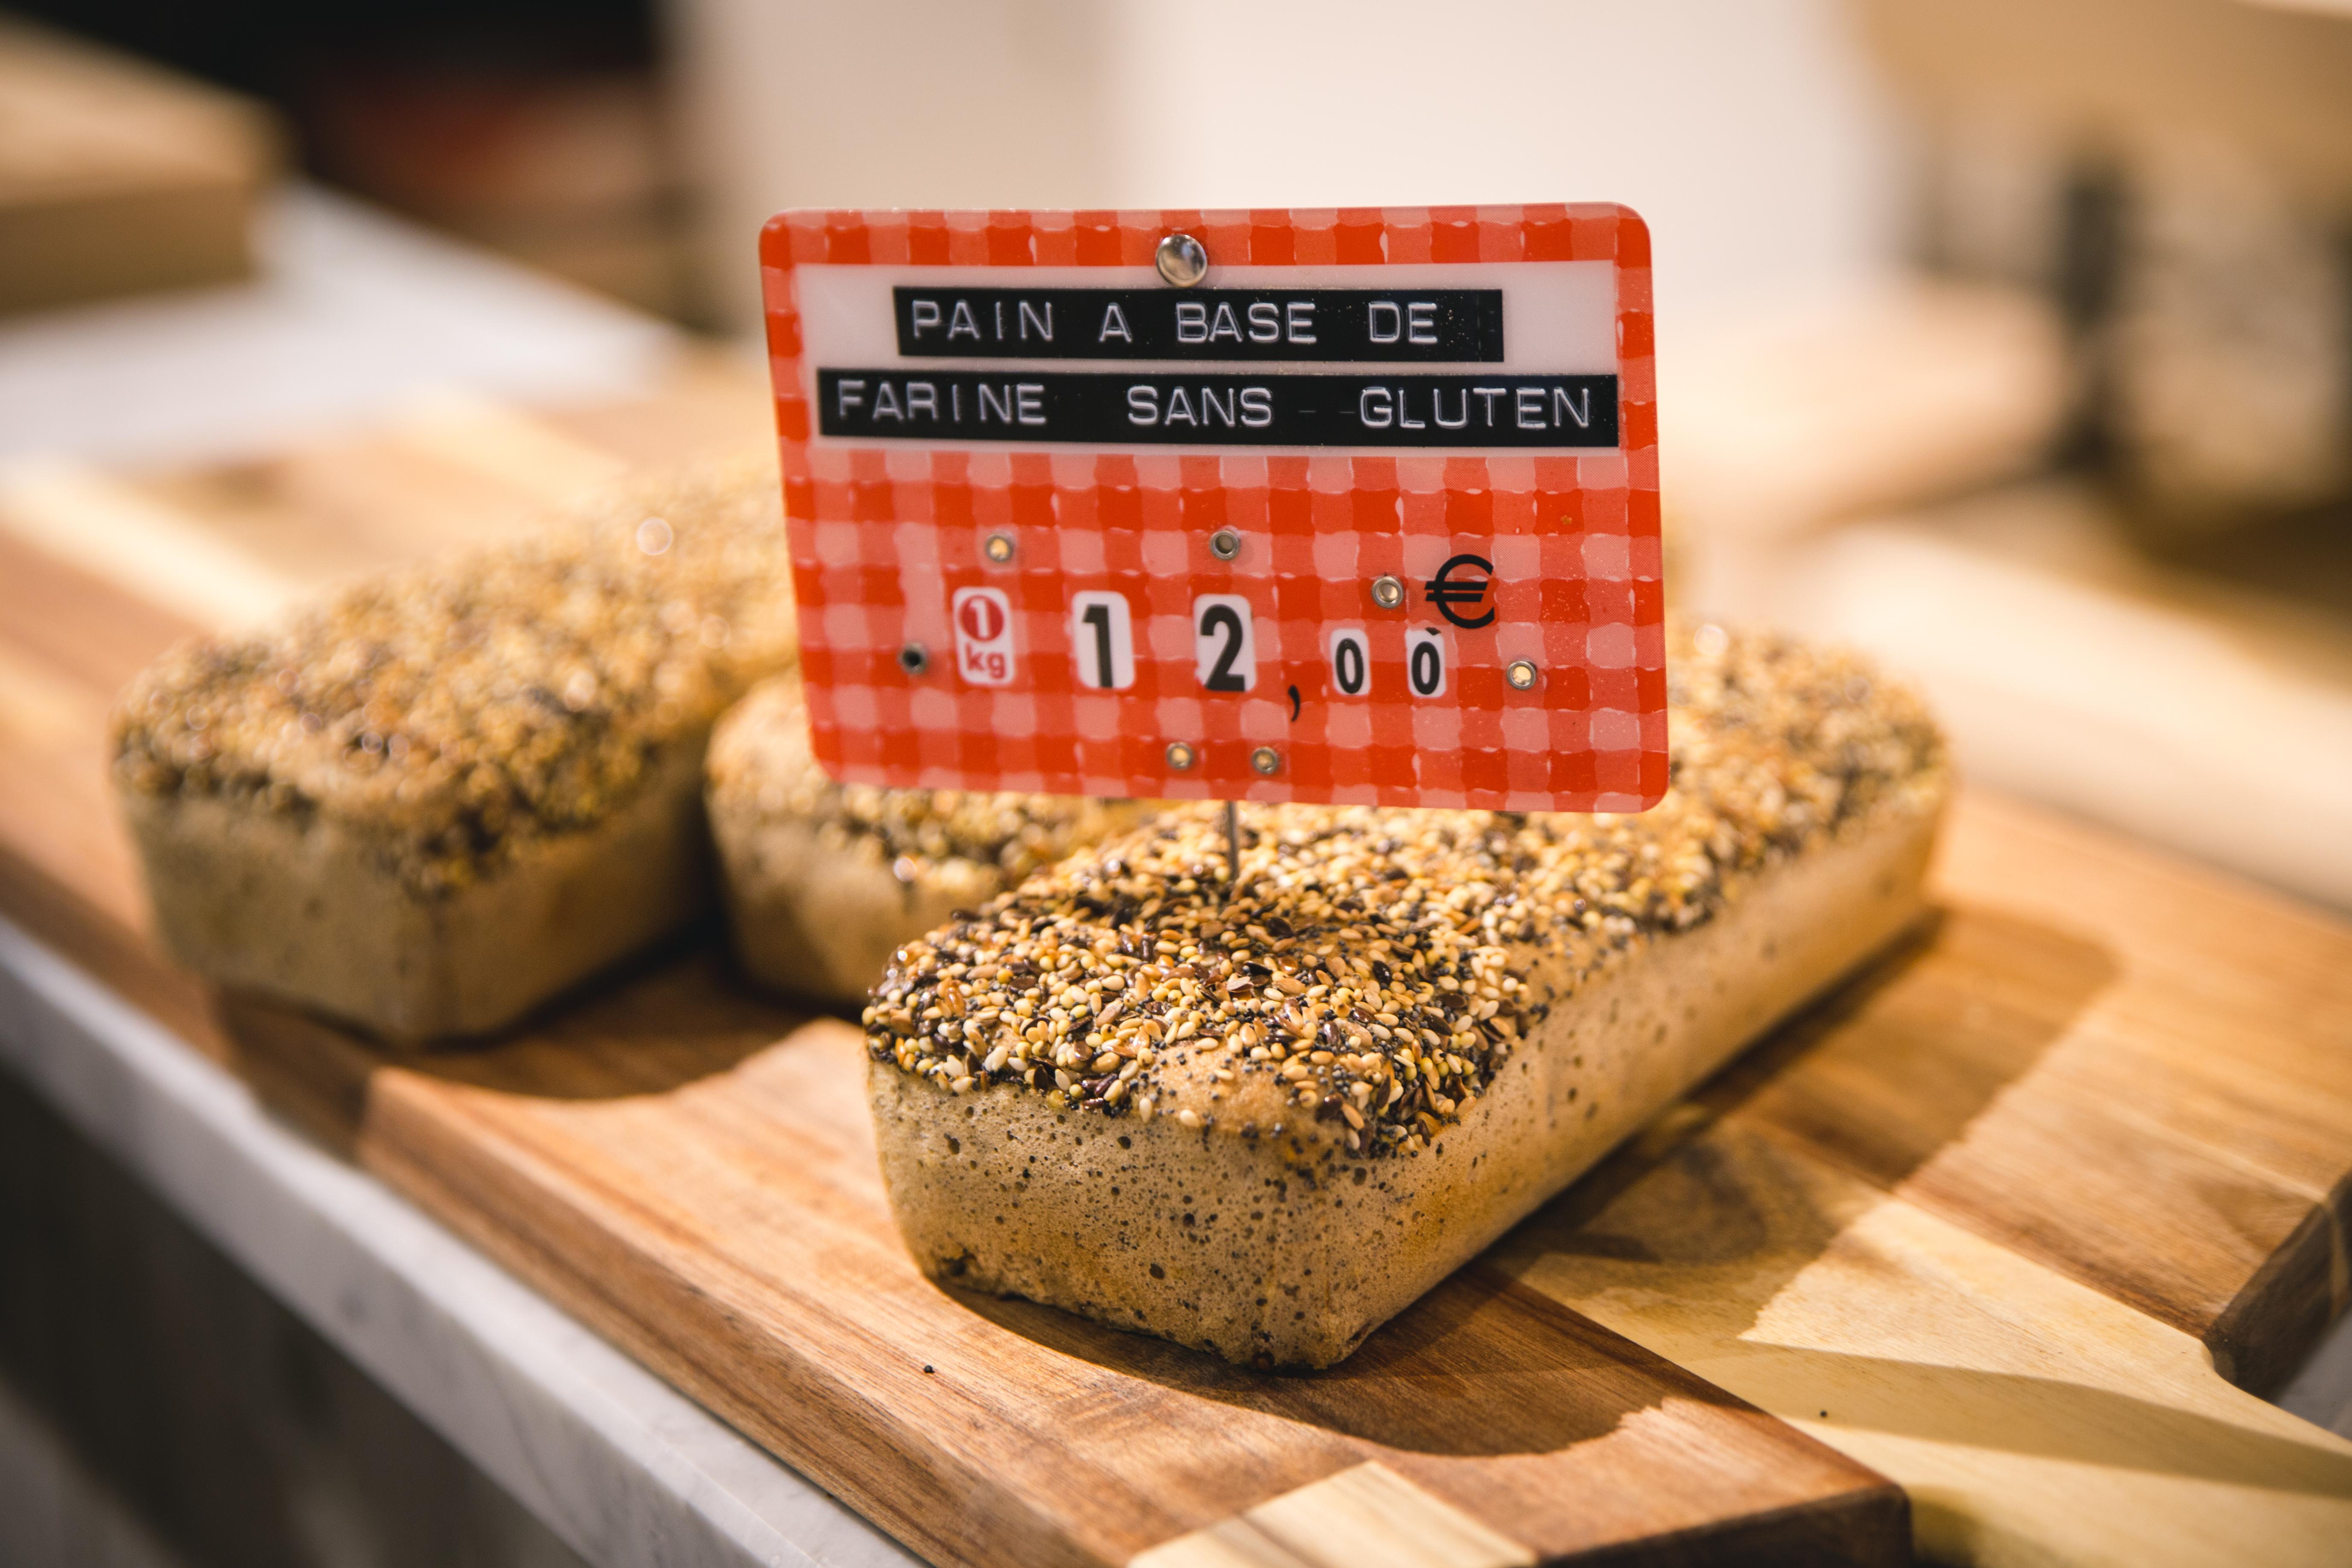 Agencement boulangerie Antoinette pains sans gluten